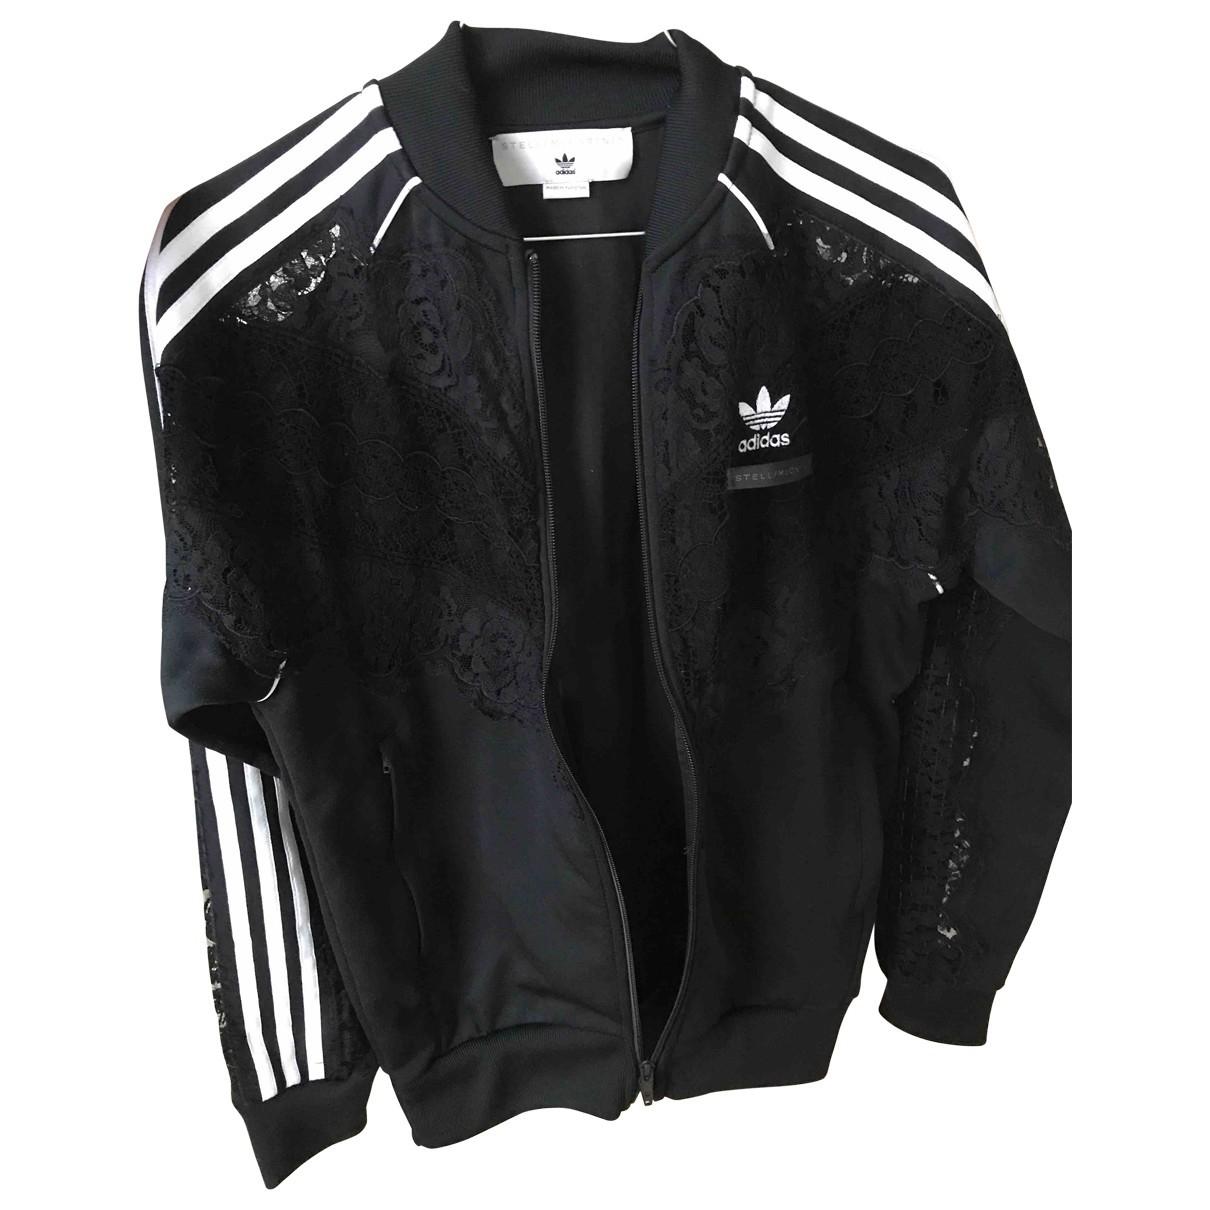 Stella Mccartney Pour Adidas \N Black Cotton jacket for Women S International